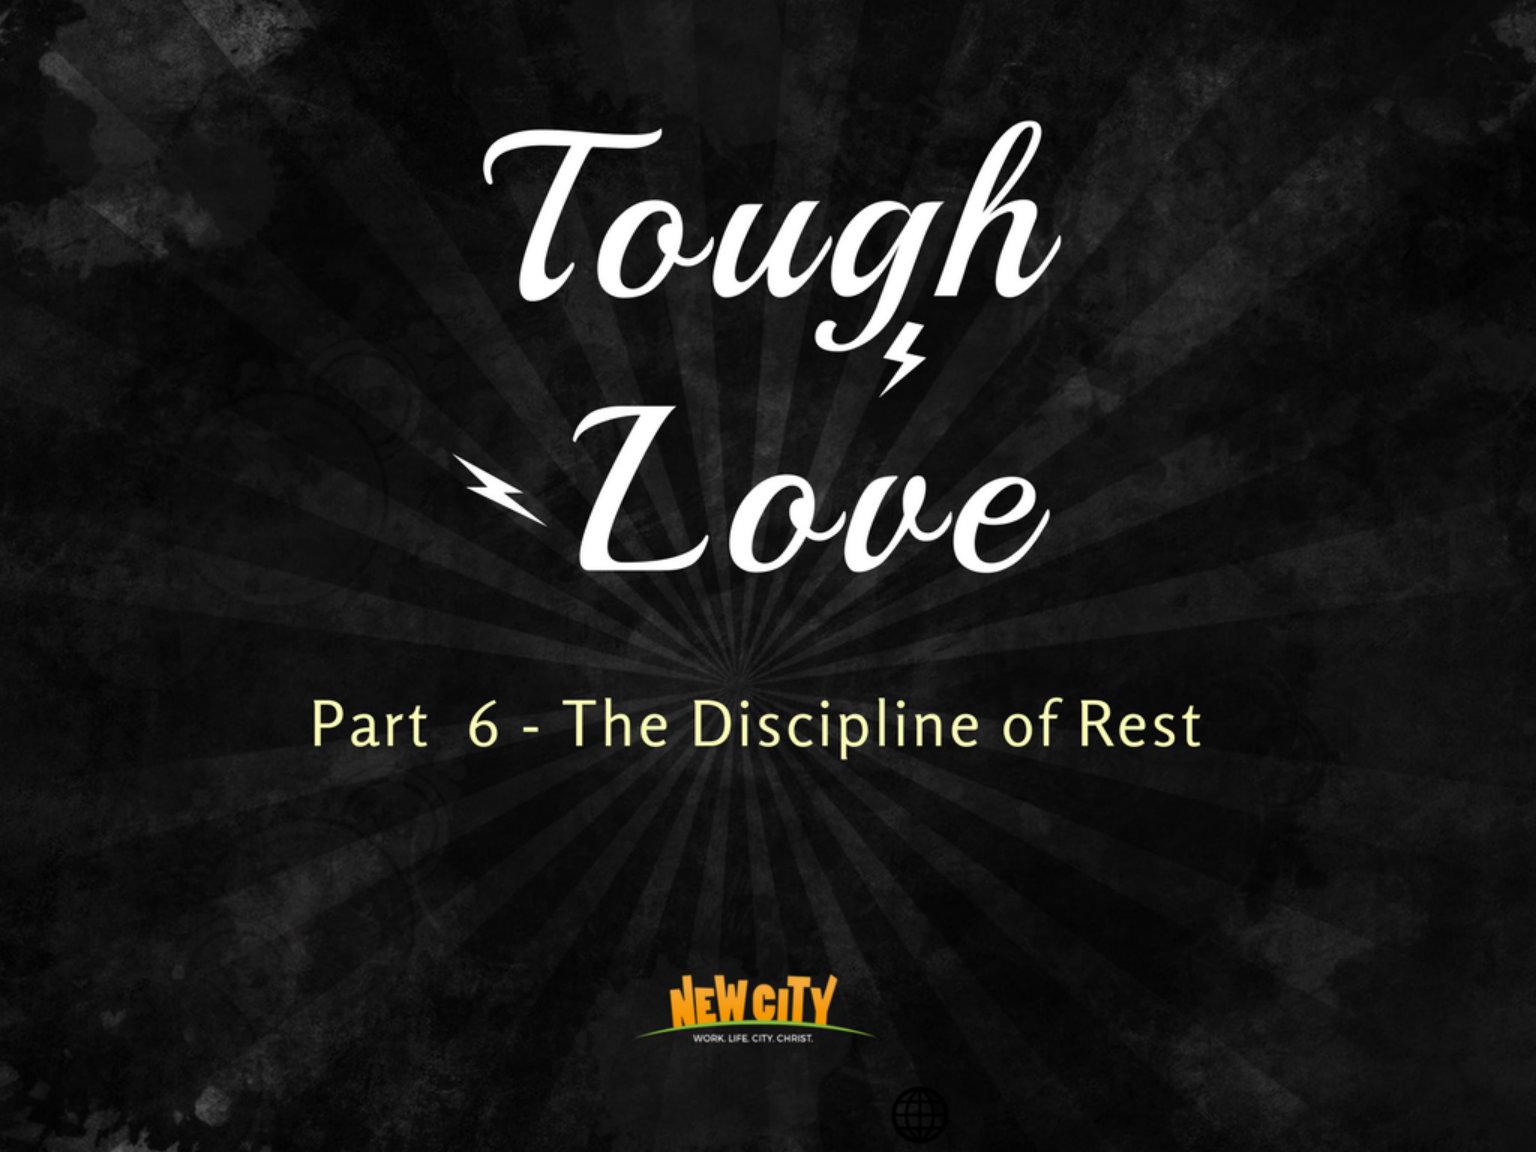 The Discipline Of Rest Image